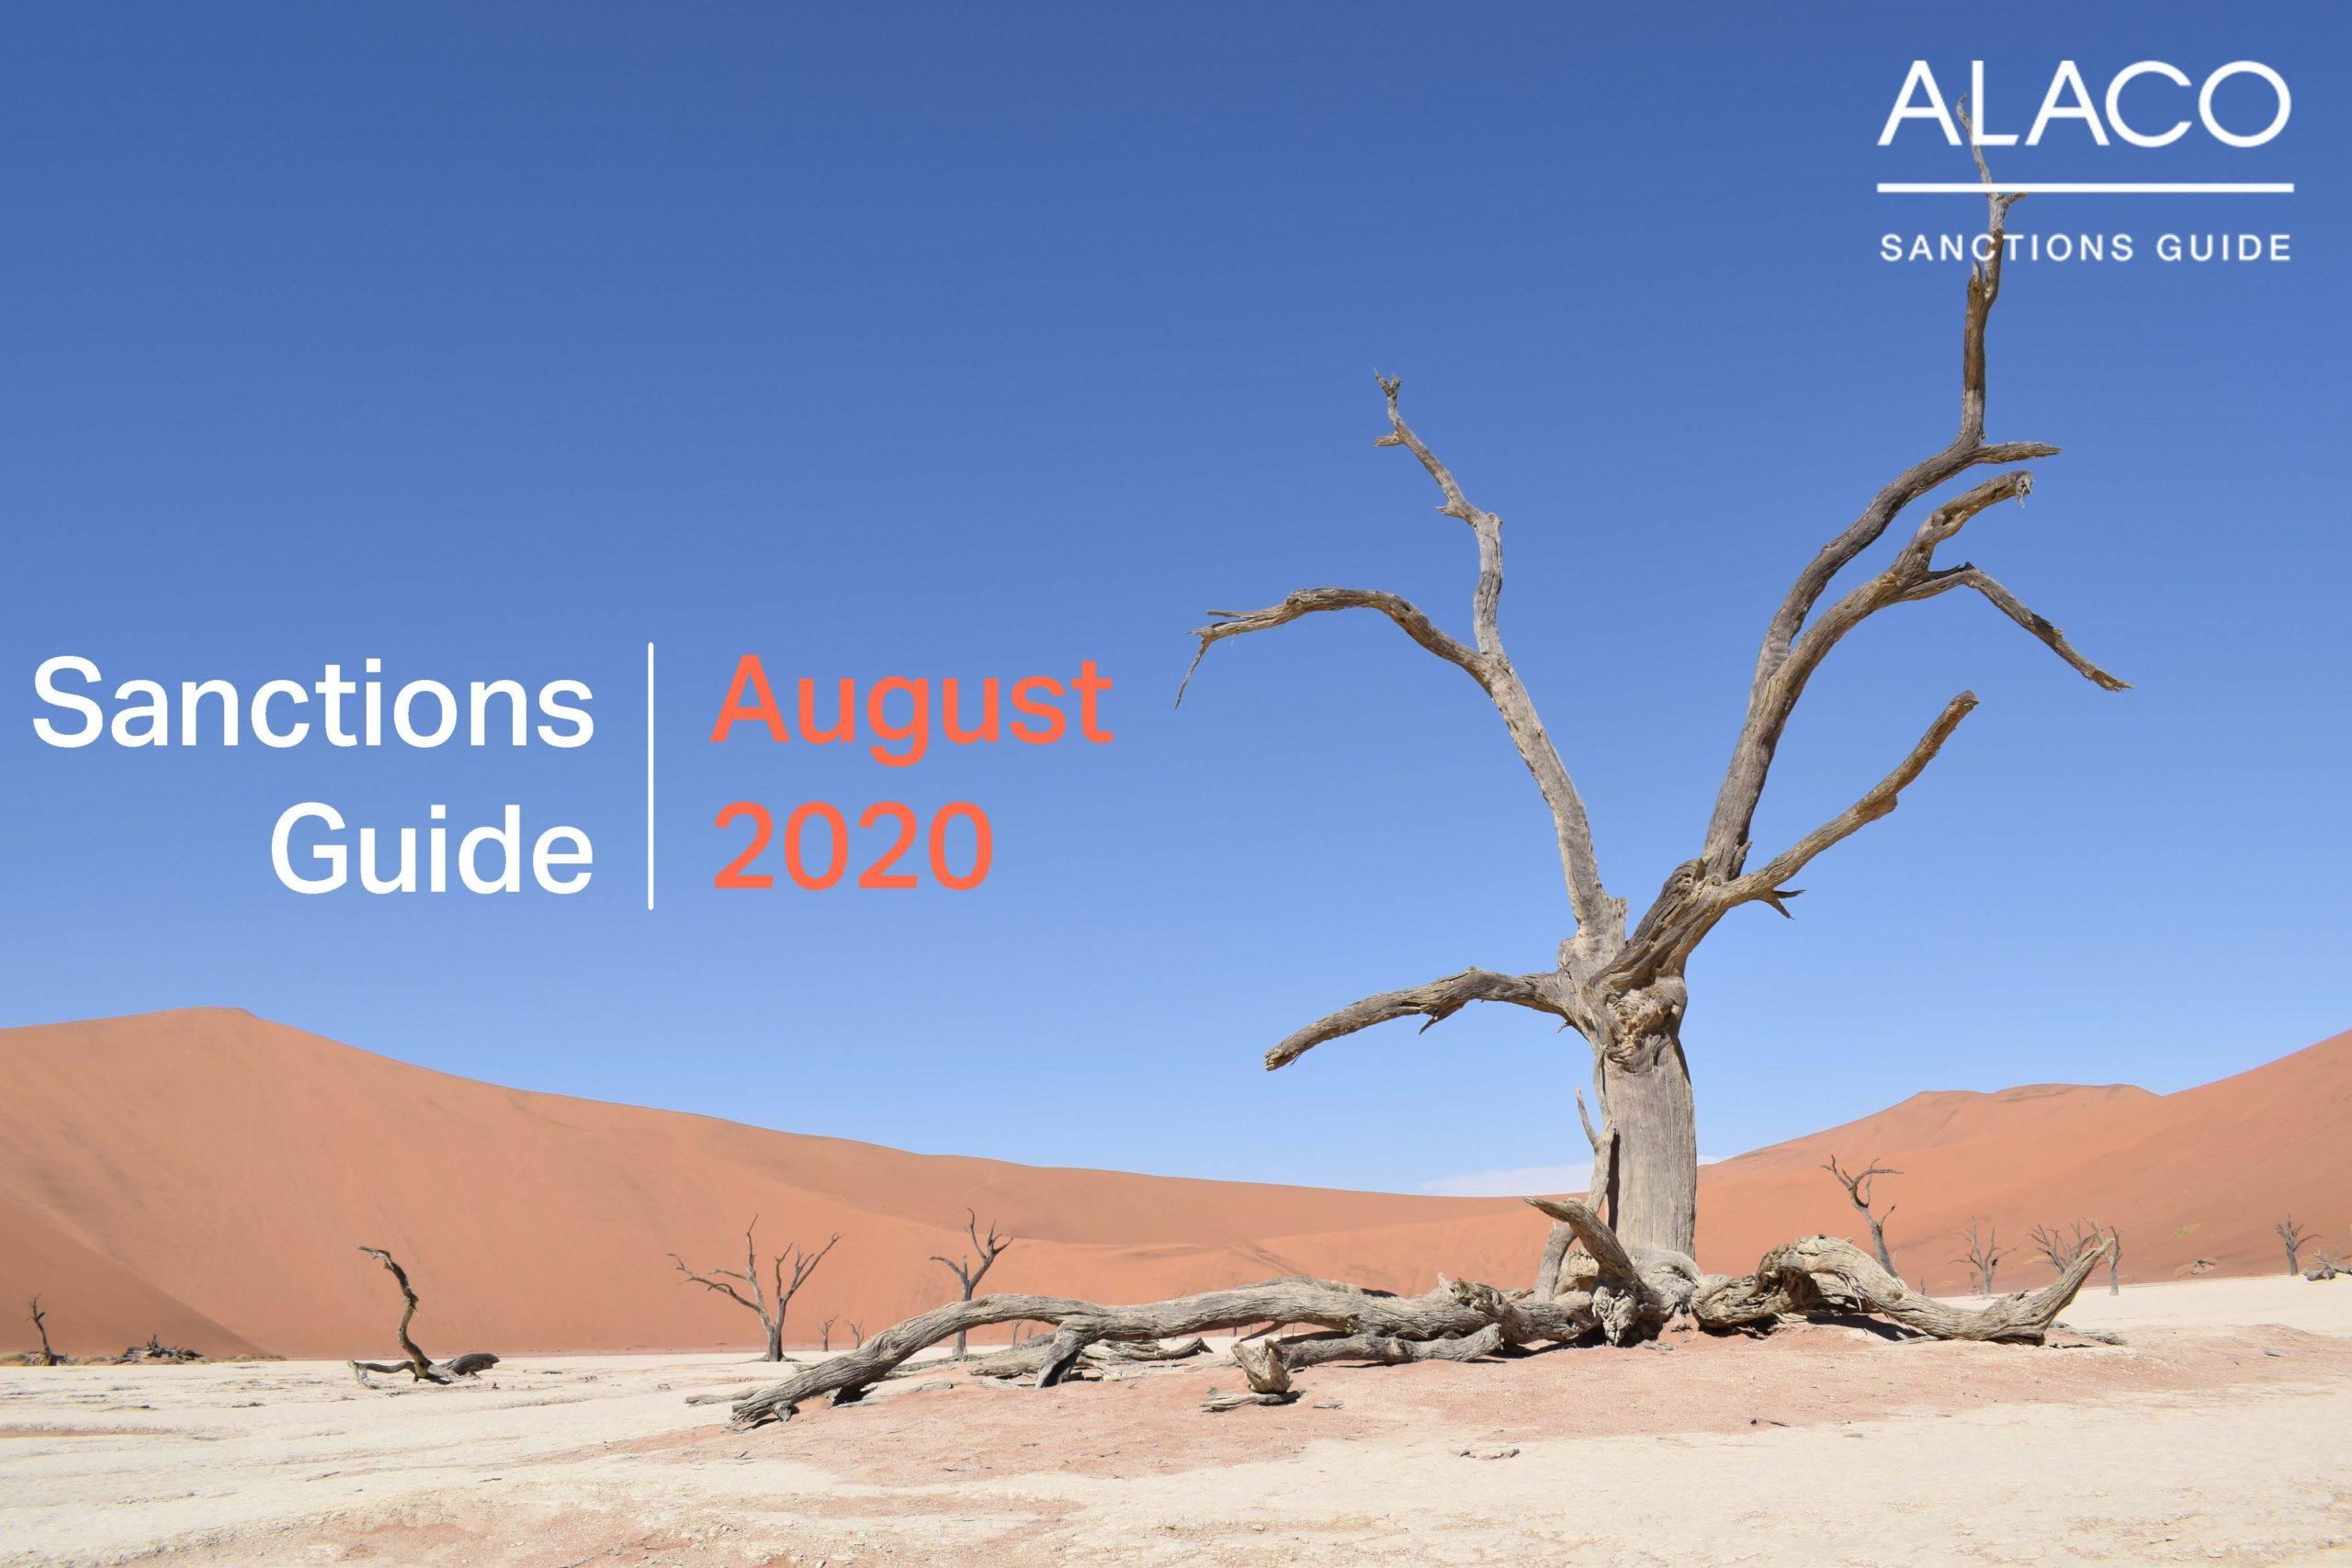 Sanctions Guide – August 2020